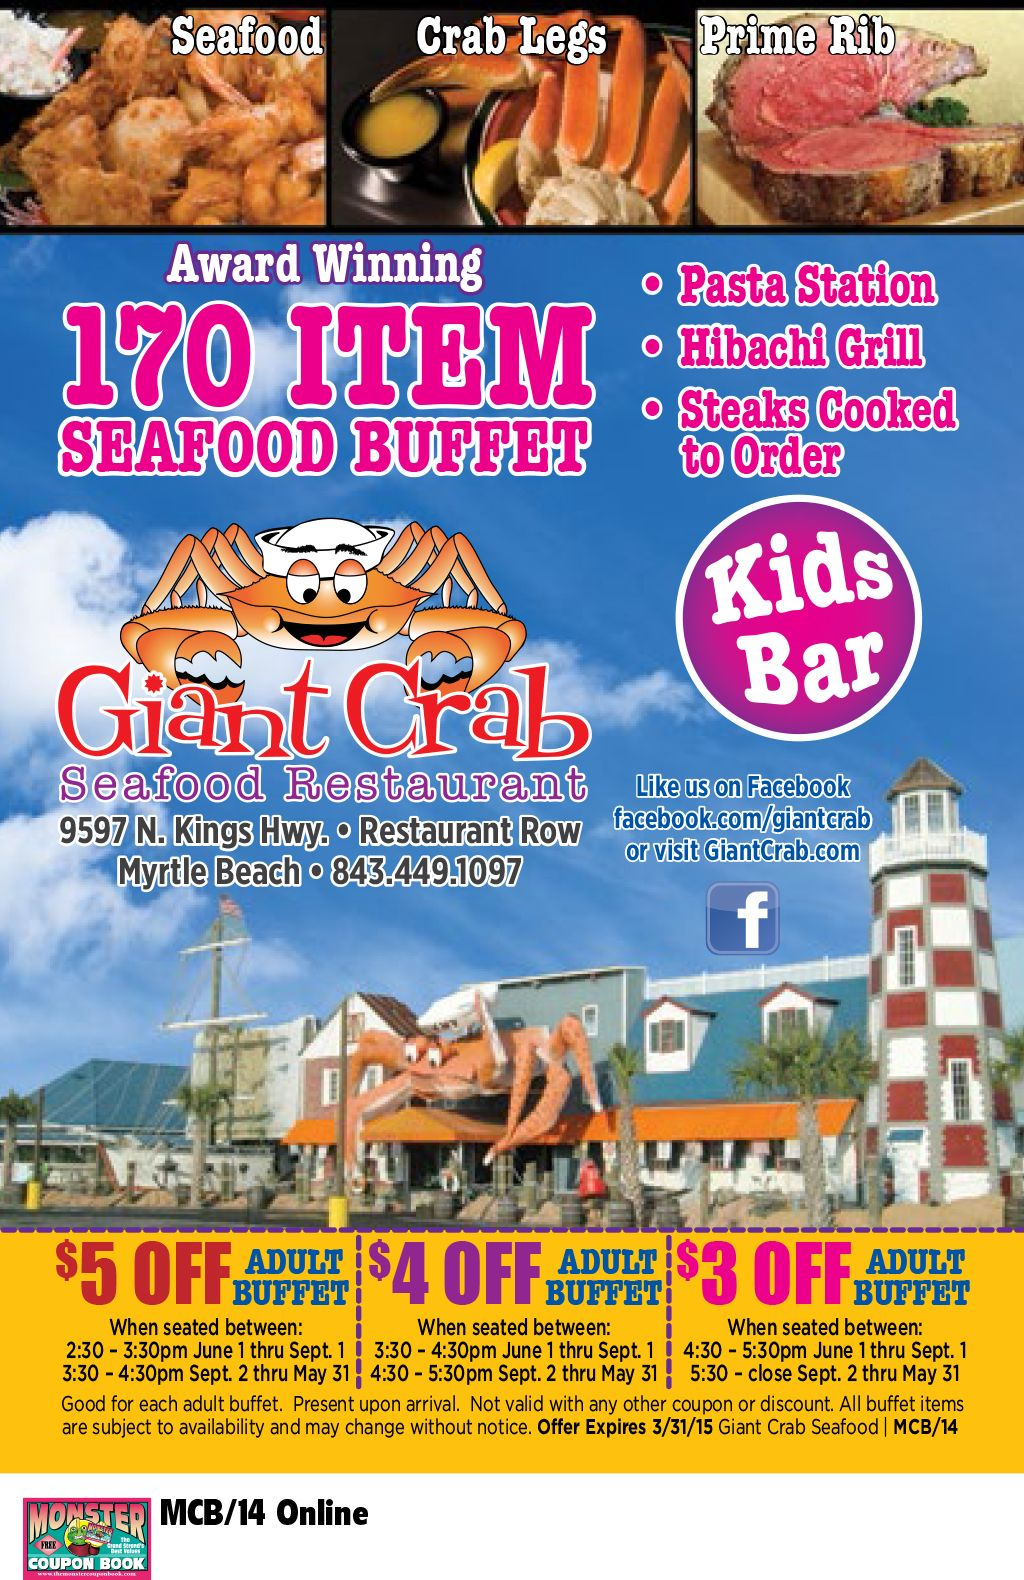 Giant Crab Seafood Restaurant Myrtle Beach Resorts